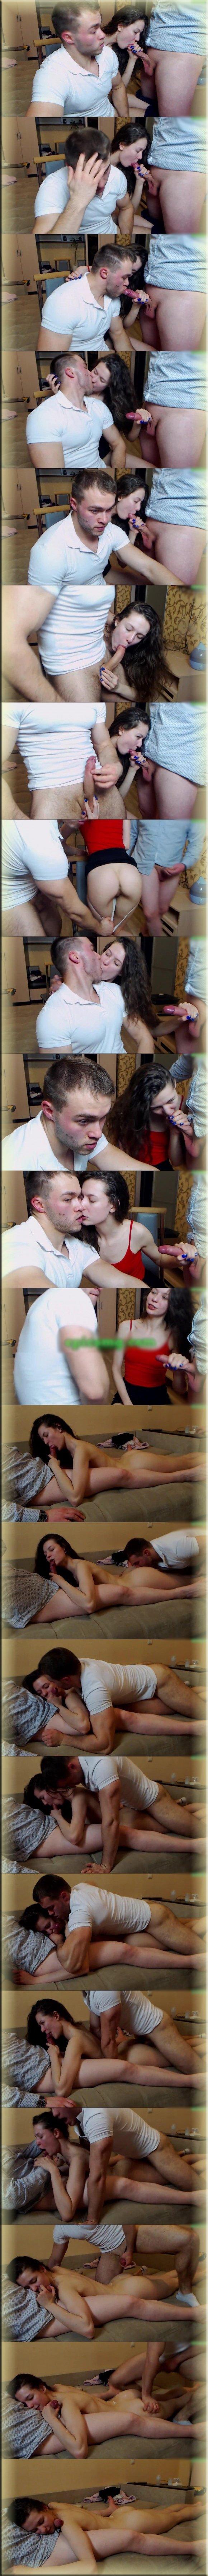 Busty Teen Webcam Dance